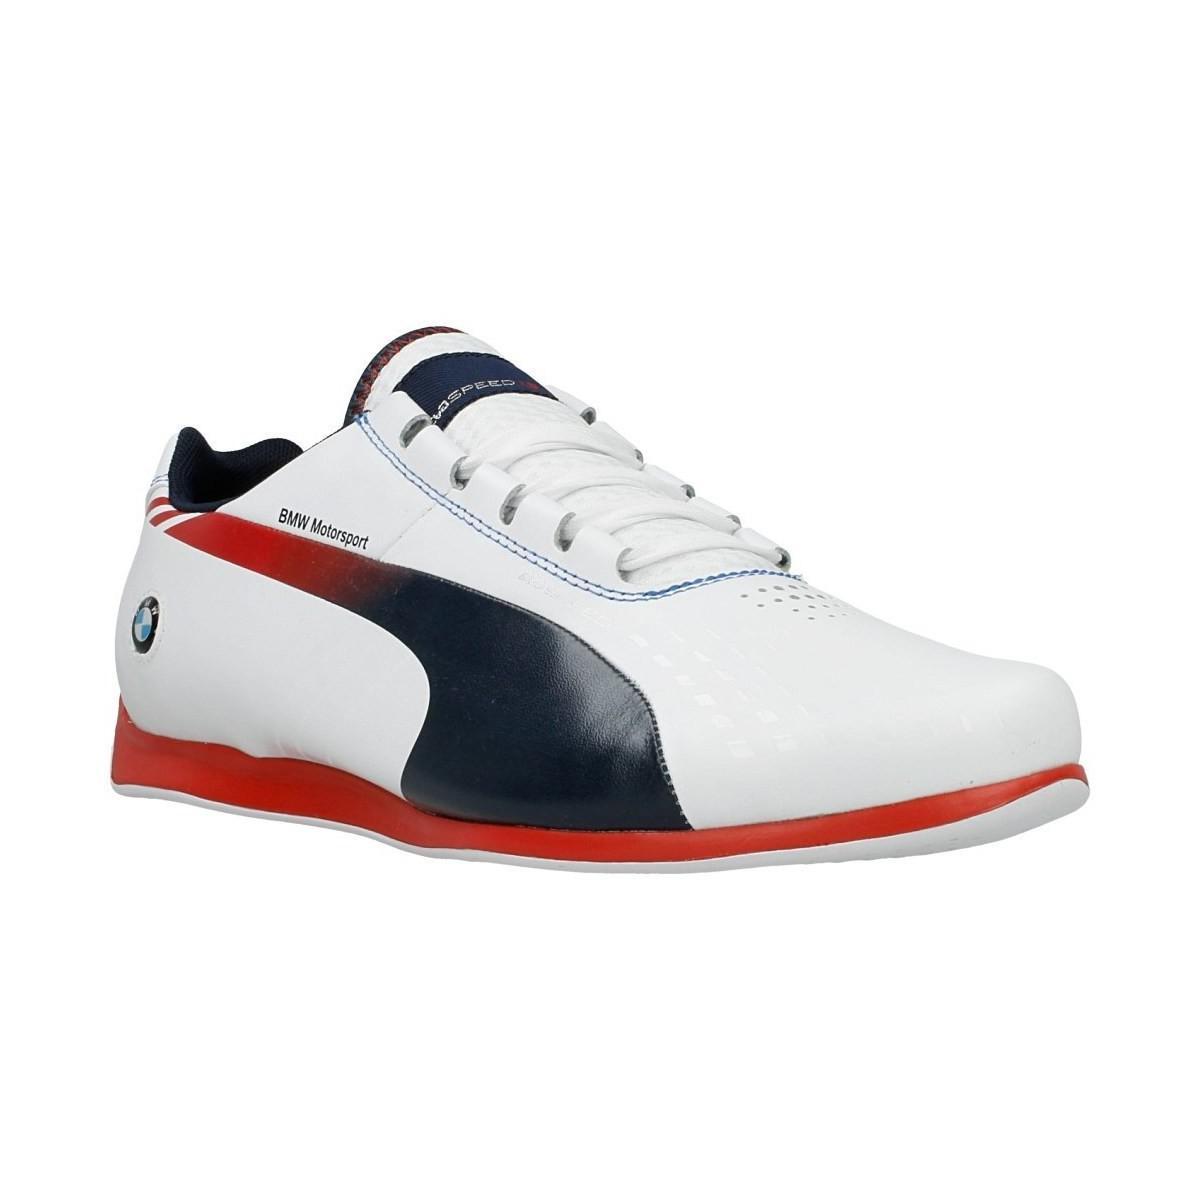 Puma ShoestrainersIn White Evospeed For Ms Men's Bmw GzVLqSpUM